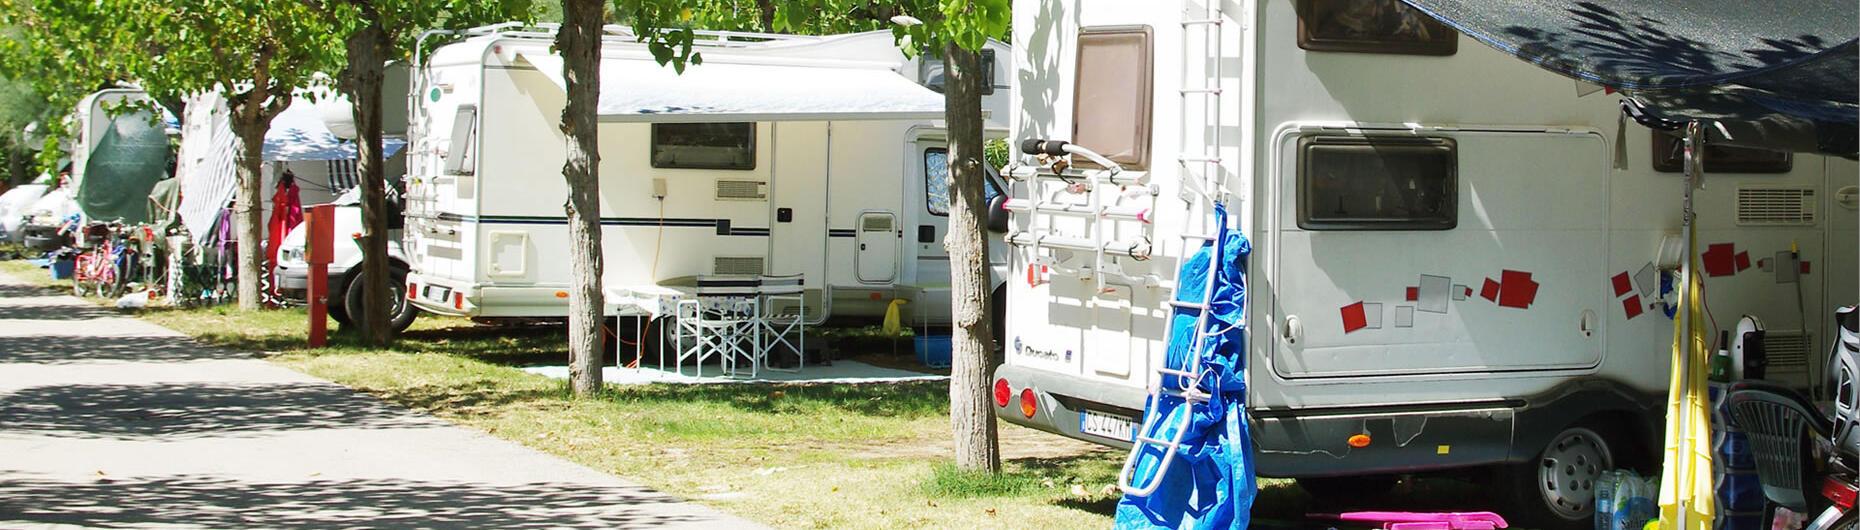 vacanzespinnaker de campingplatze-in-den-marken 004